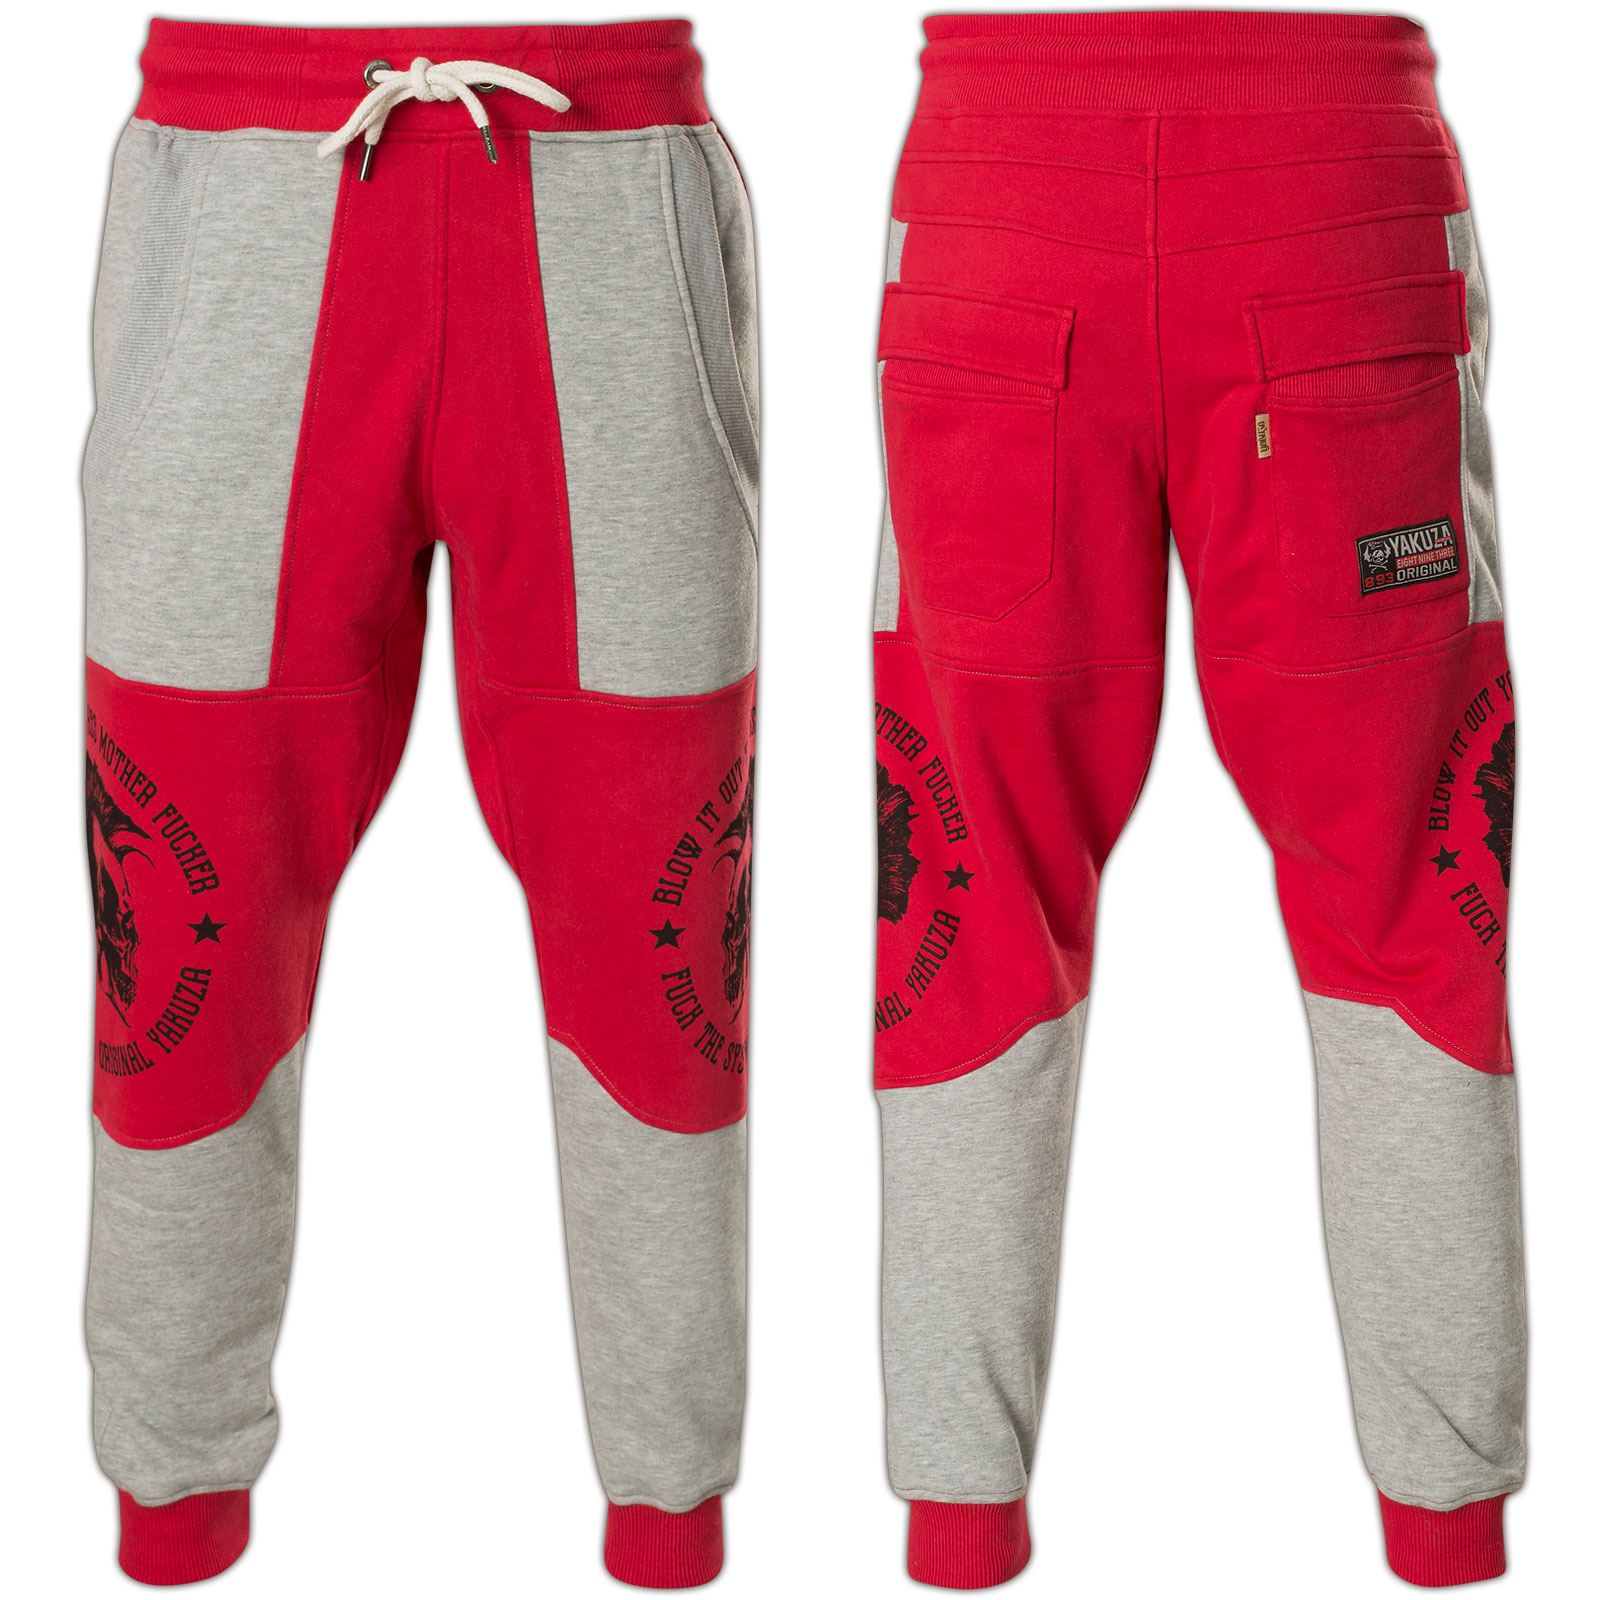 43eb70530a6f71 Yakuza Jogginghose Punx Two Face Anti Fit Jogger JOB-11030 Ribbon Red Rot  ...